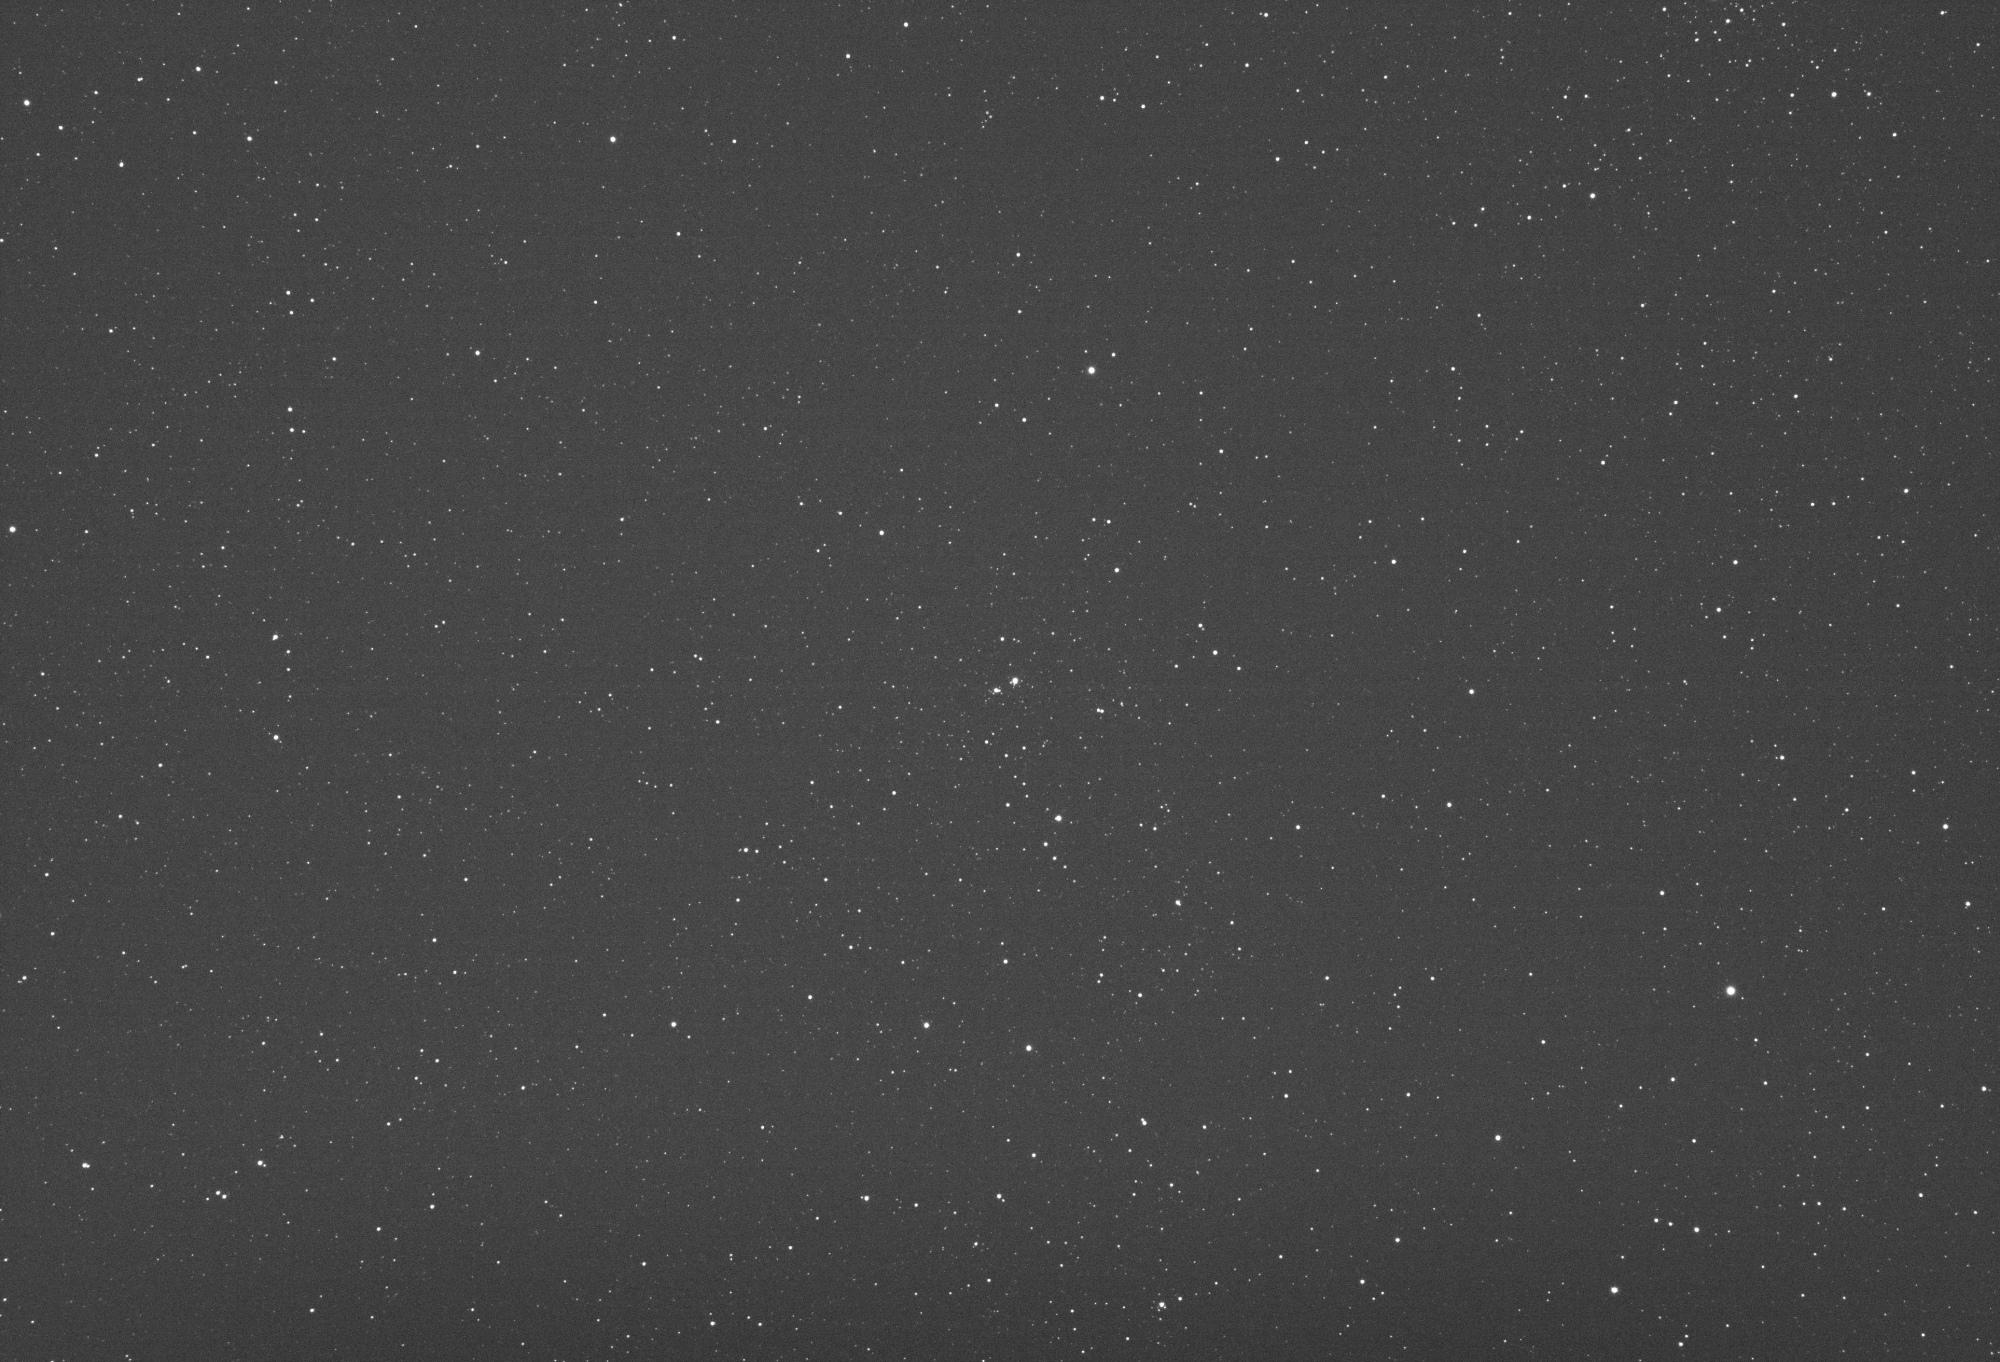 Light_IC1848_10s_1x1_gain117_-0.3C_0002.thumb.jpg.d97297aa803eca0174396272924b8656.jpg